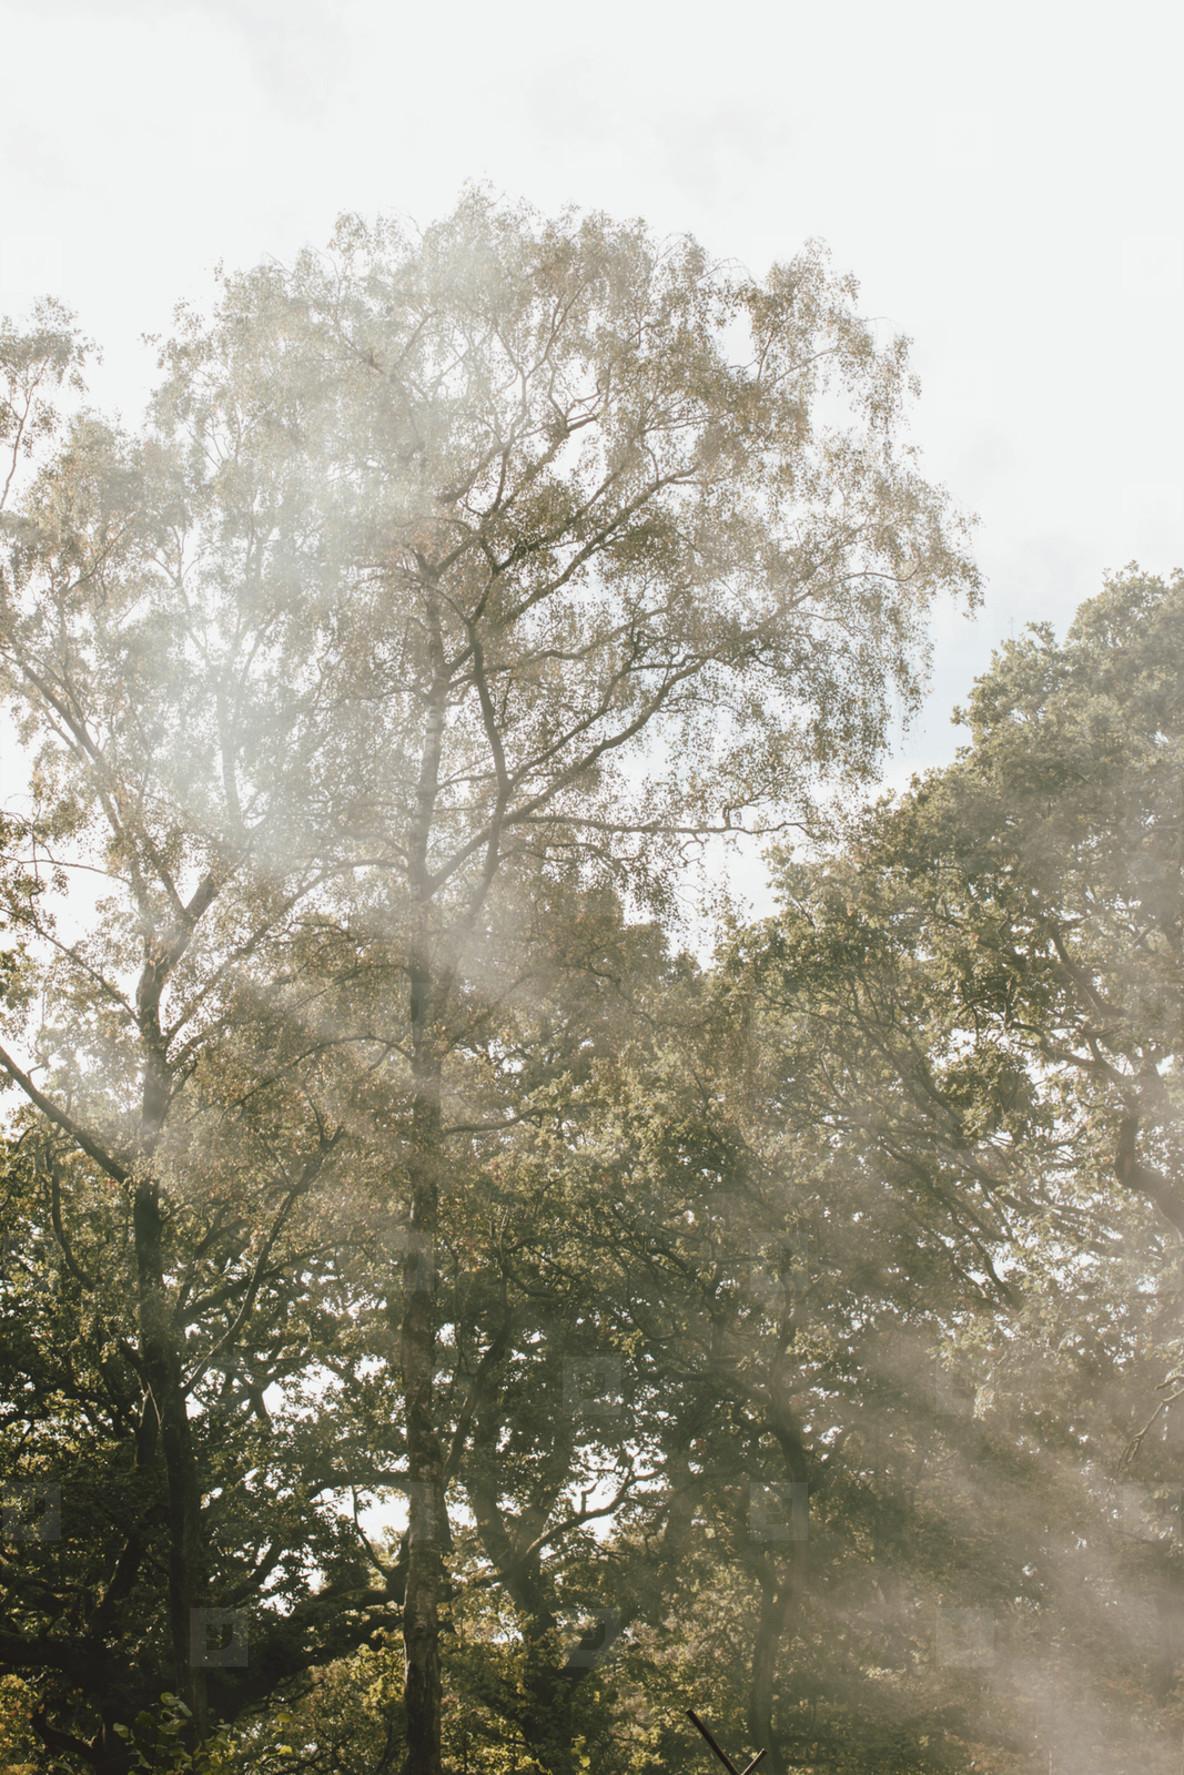 Sun shining through trees in woods